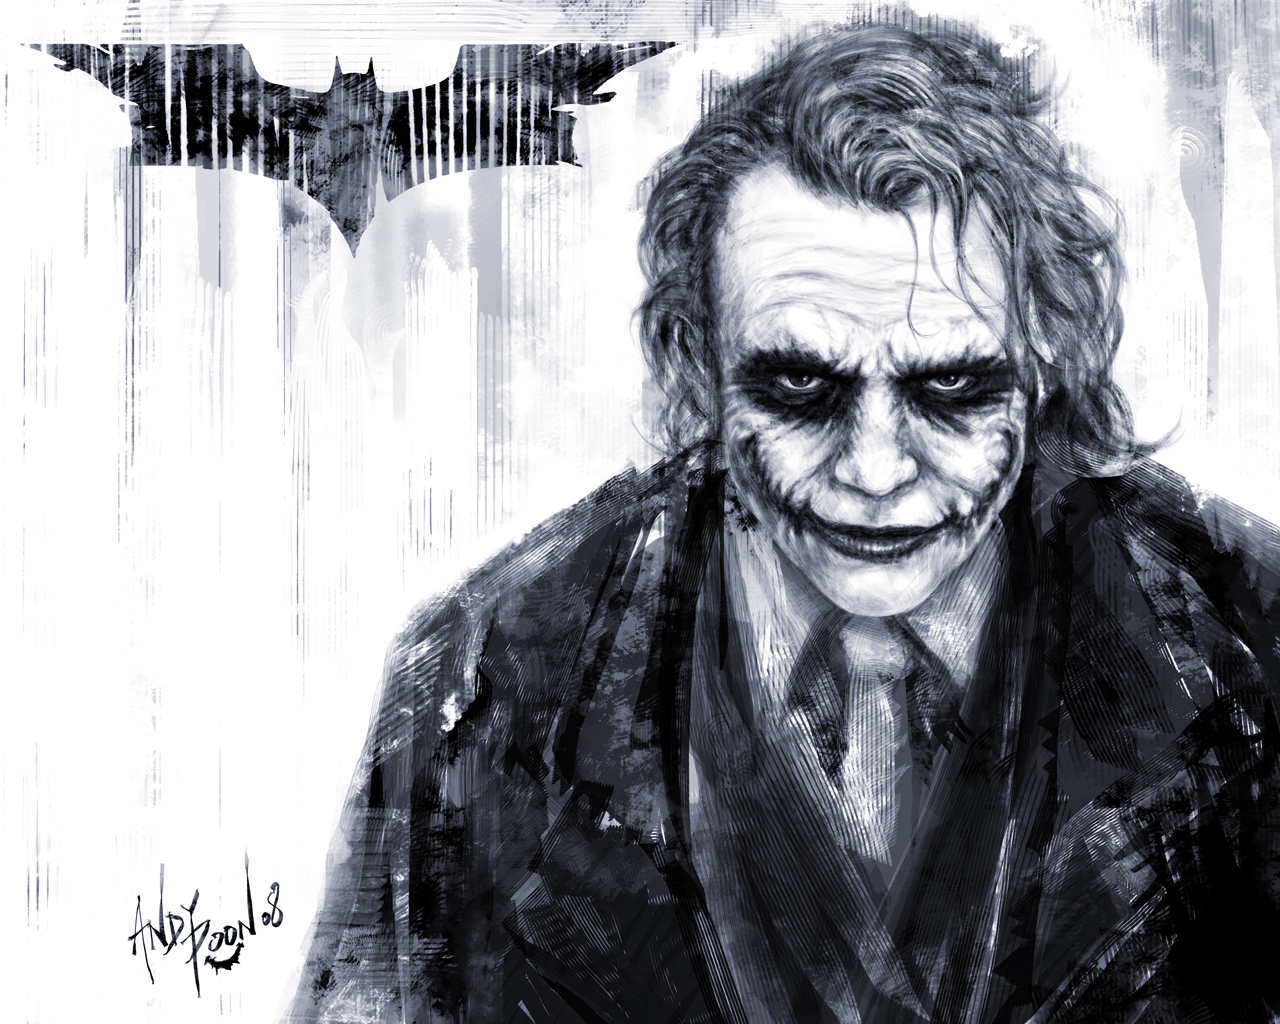 http://1.bp.blogspot.com/-EpXmRjfzGh4/URUudGovRNI/AAAAAAAAACo/AI3IlNGbgRg/s1600/Joker%2520Wallpaper.jpg